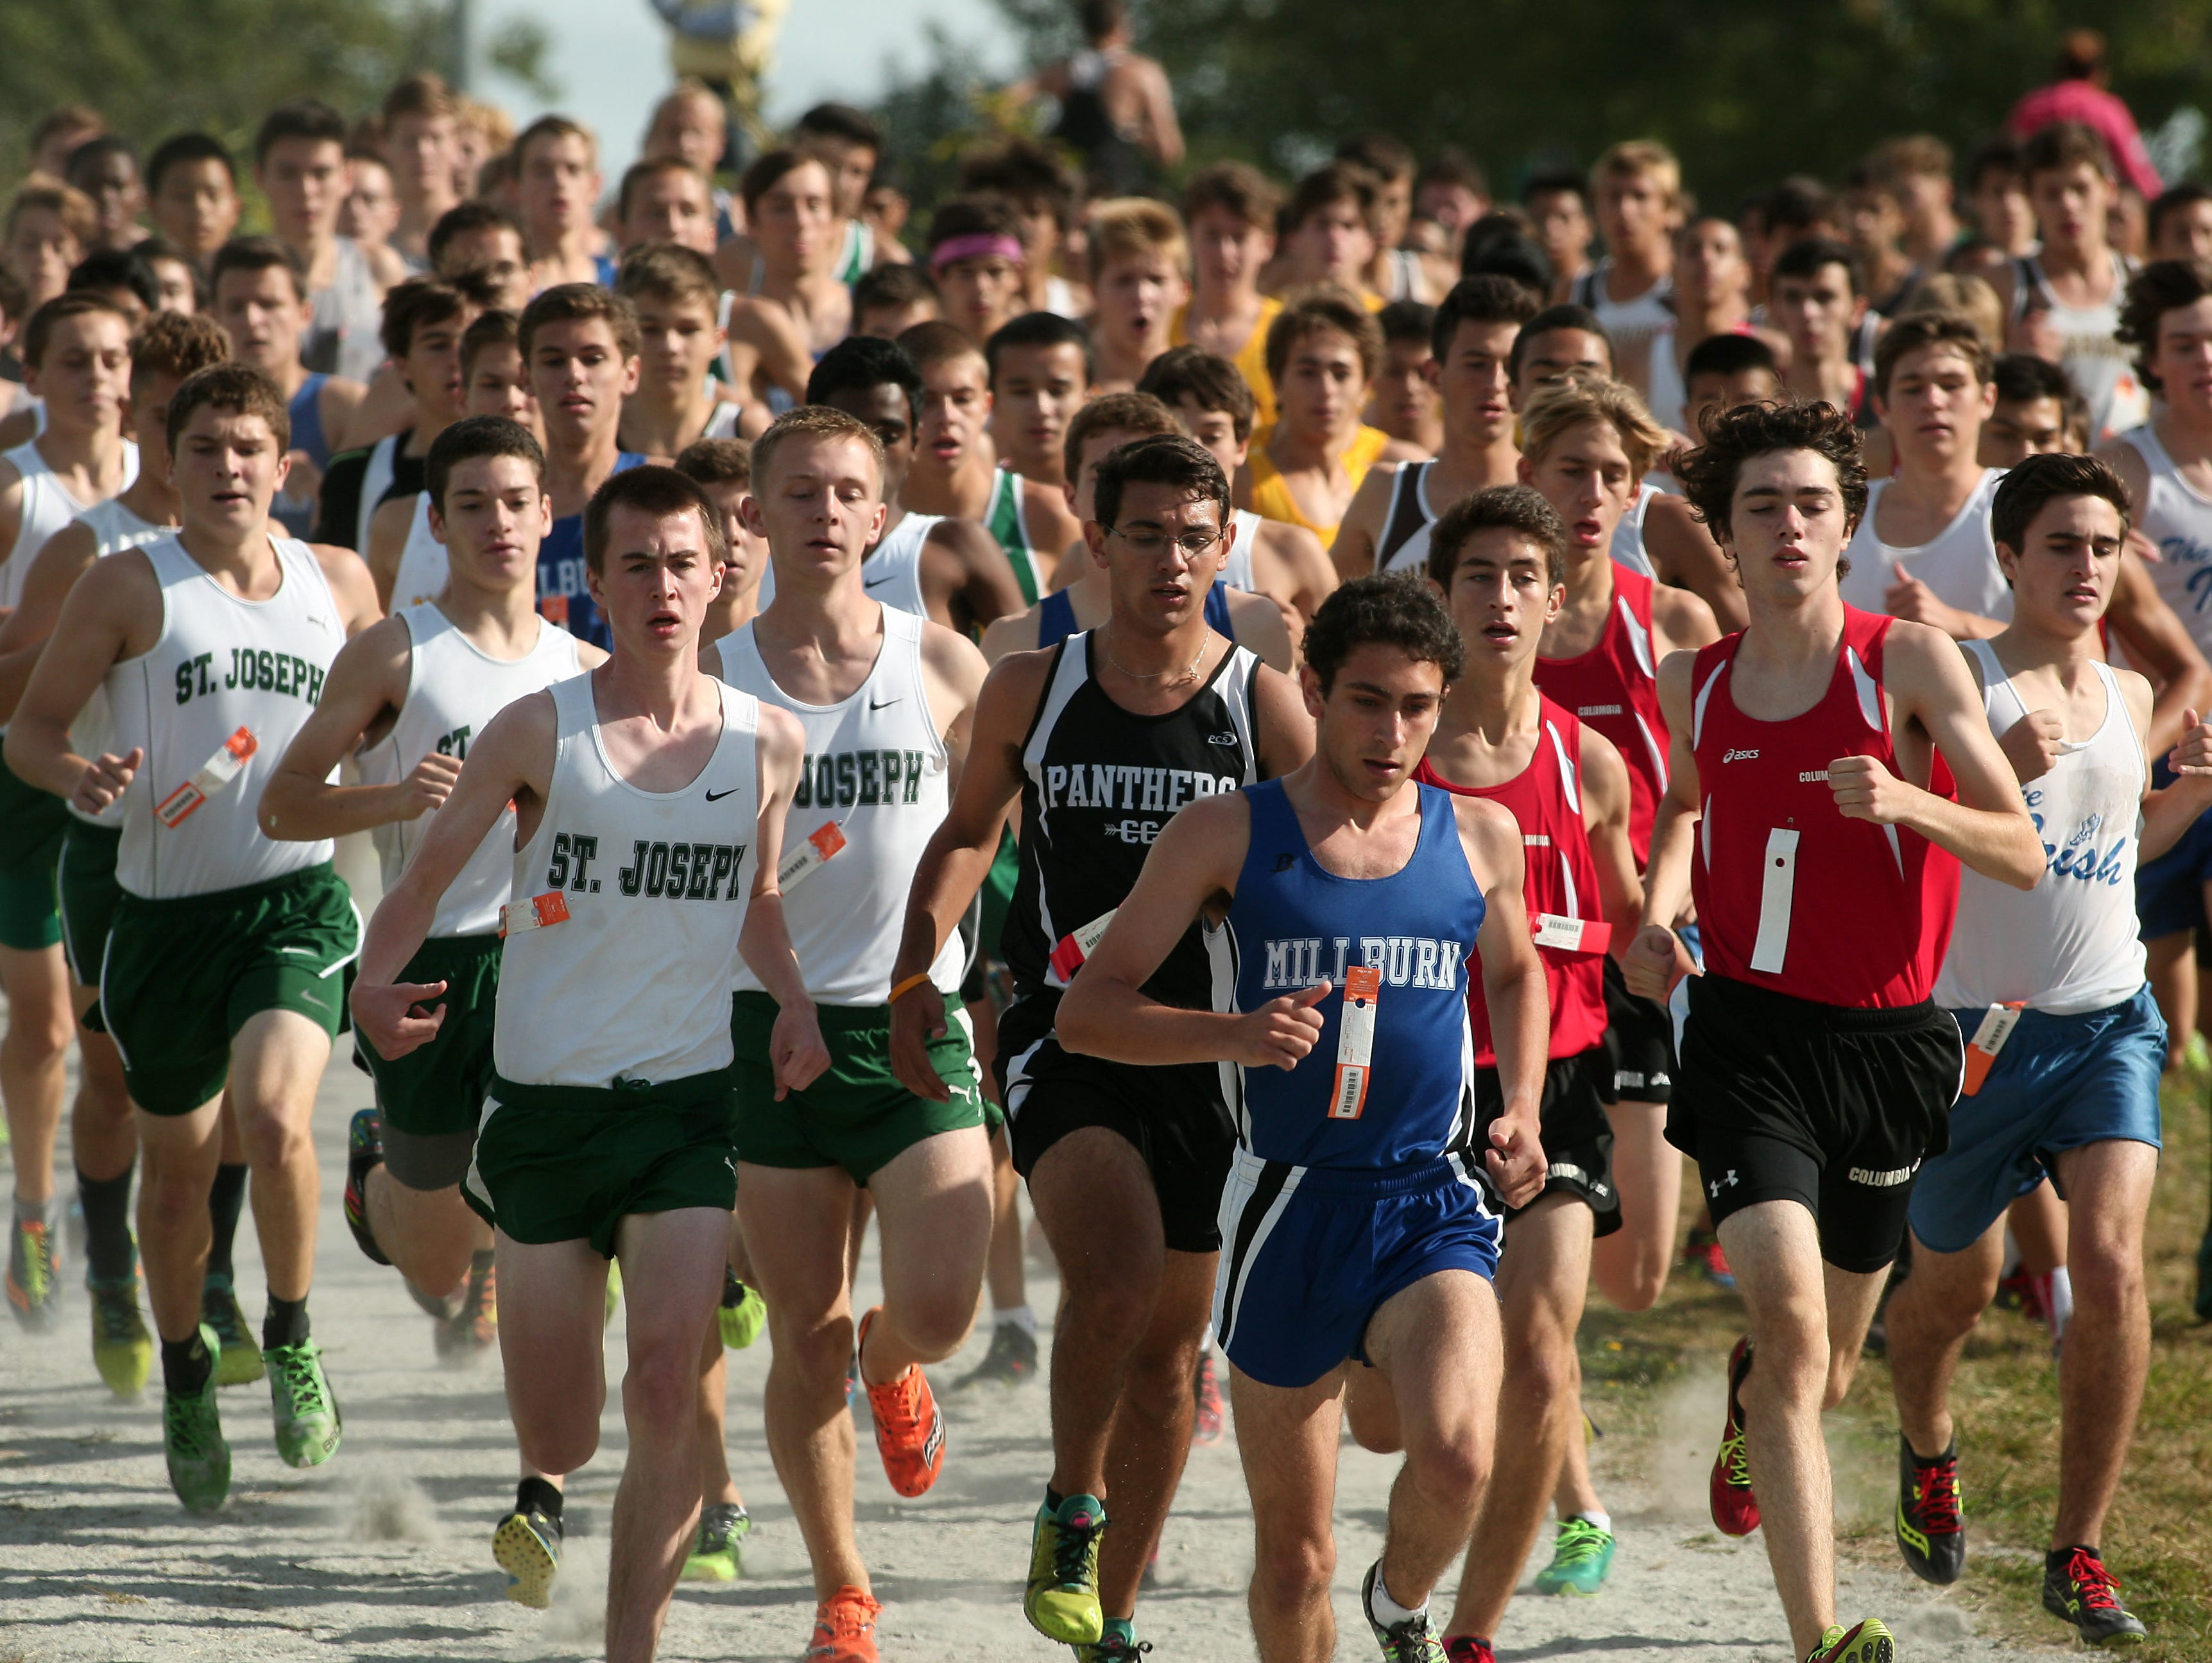 The start of the Varsity boys A 5K run of the Stewart Memorial Invitational at Central Park of Morris County. September 26, 2015, Morris Plains, NJ.